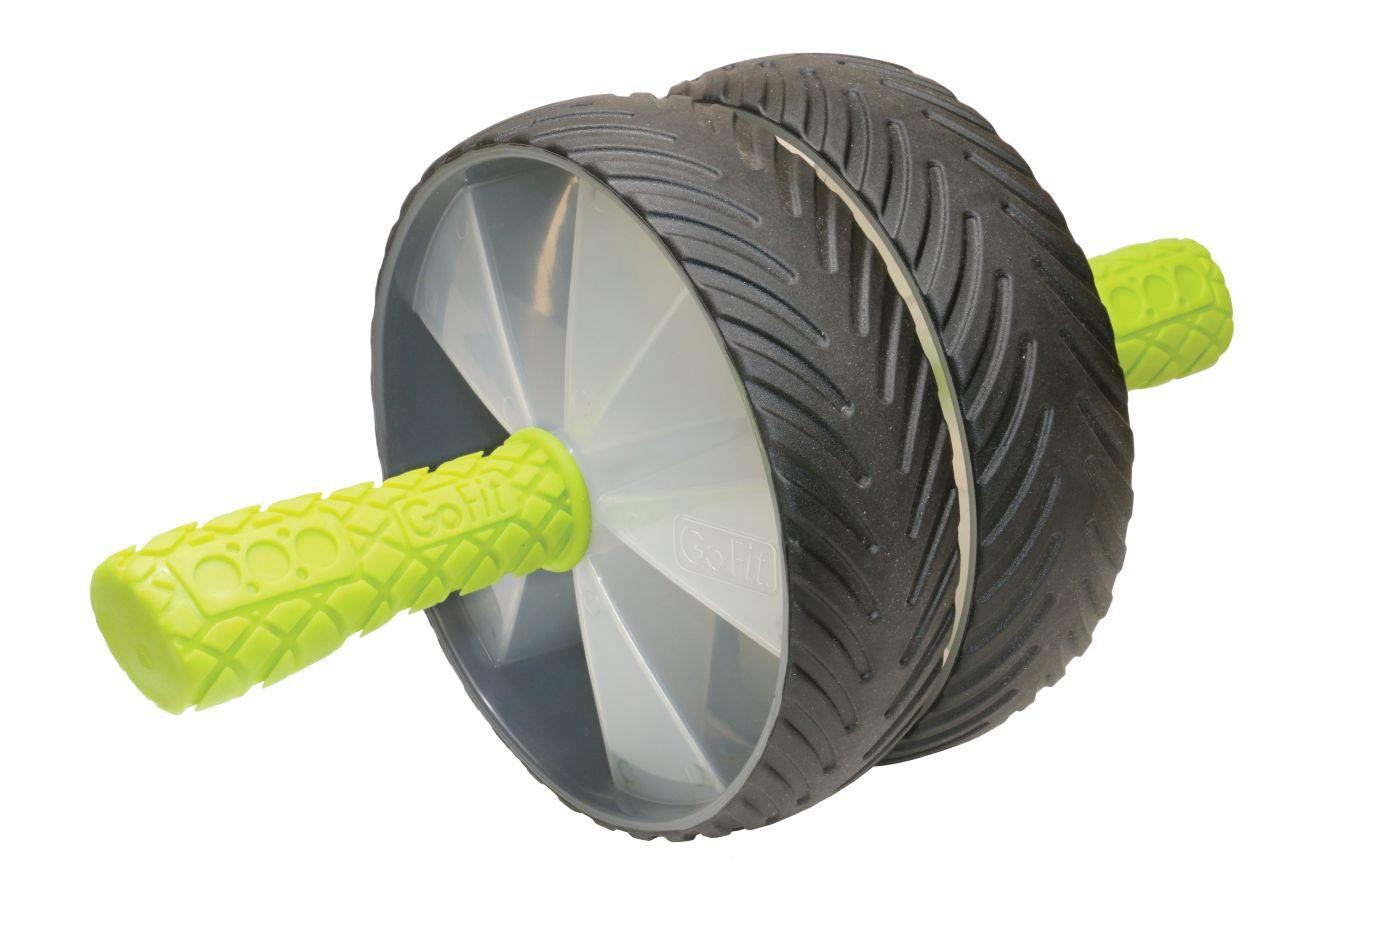 GoFit Deluxe Dual Ab Wheel